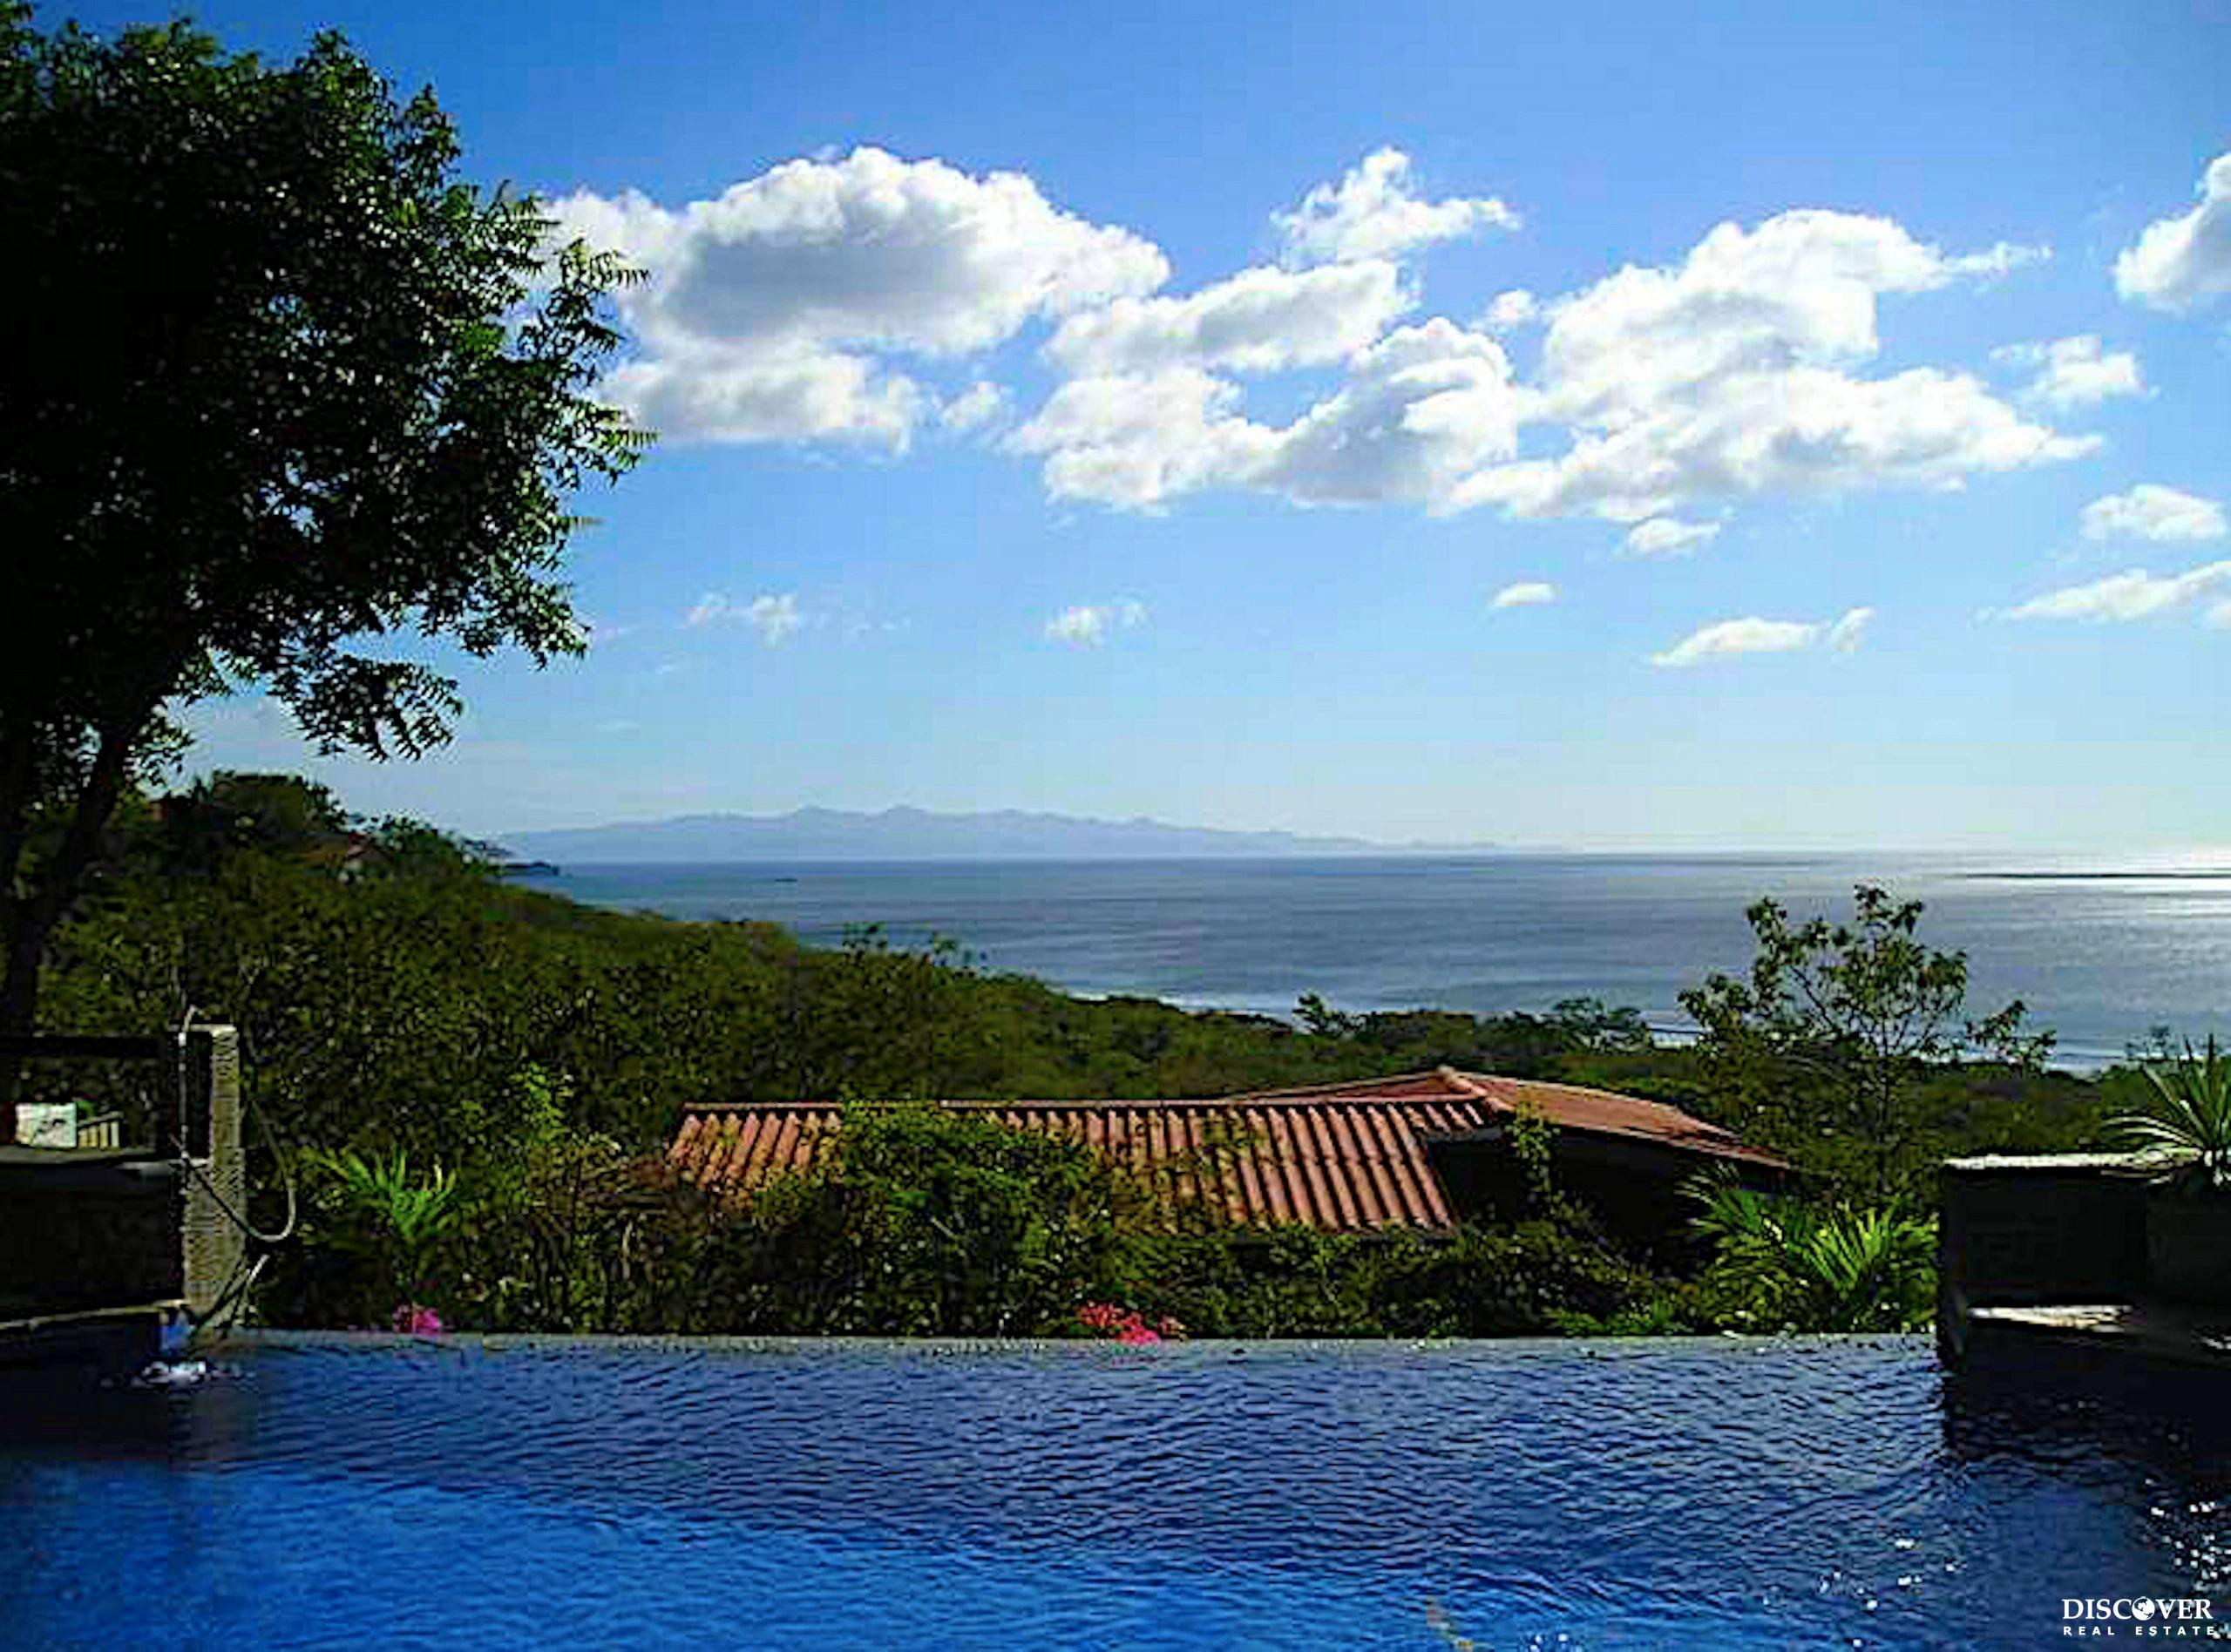 Casa Mariposa in Playa El Coco, Nicaragua